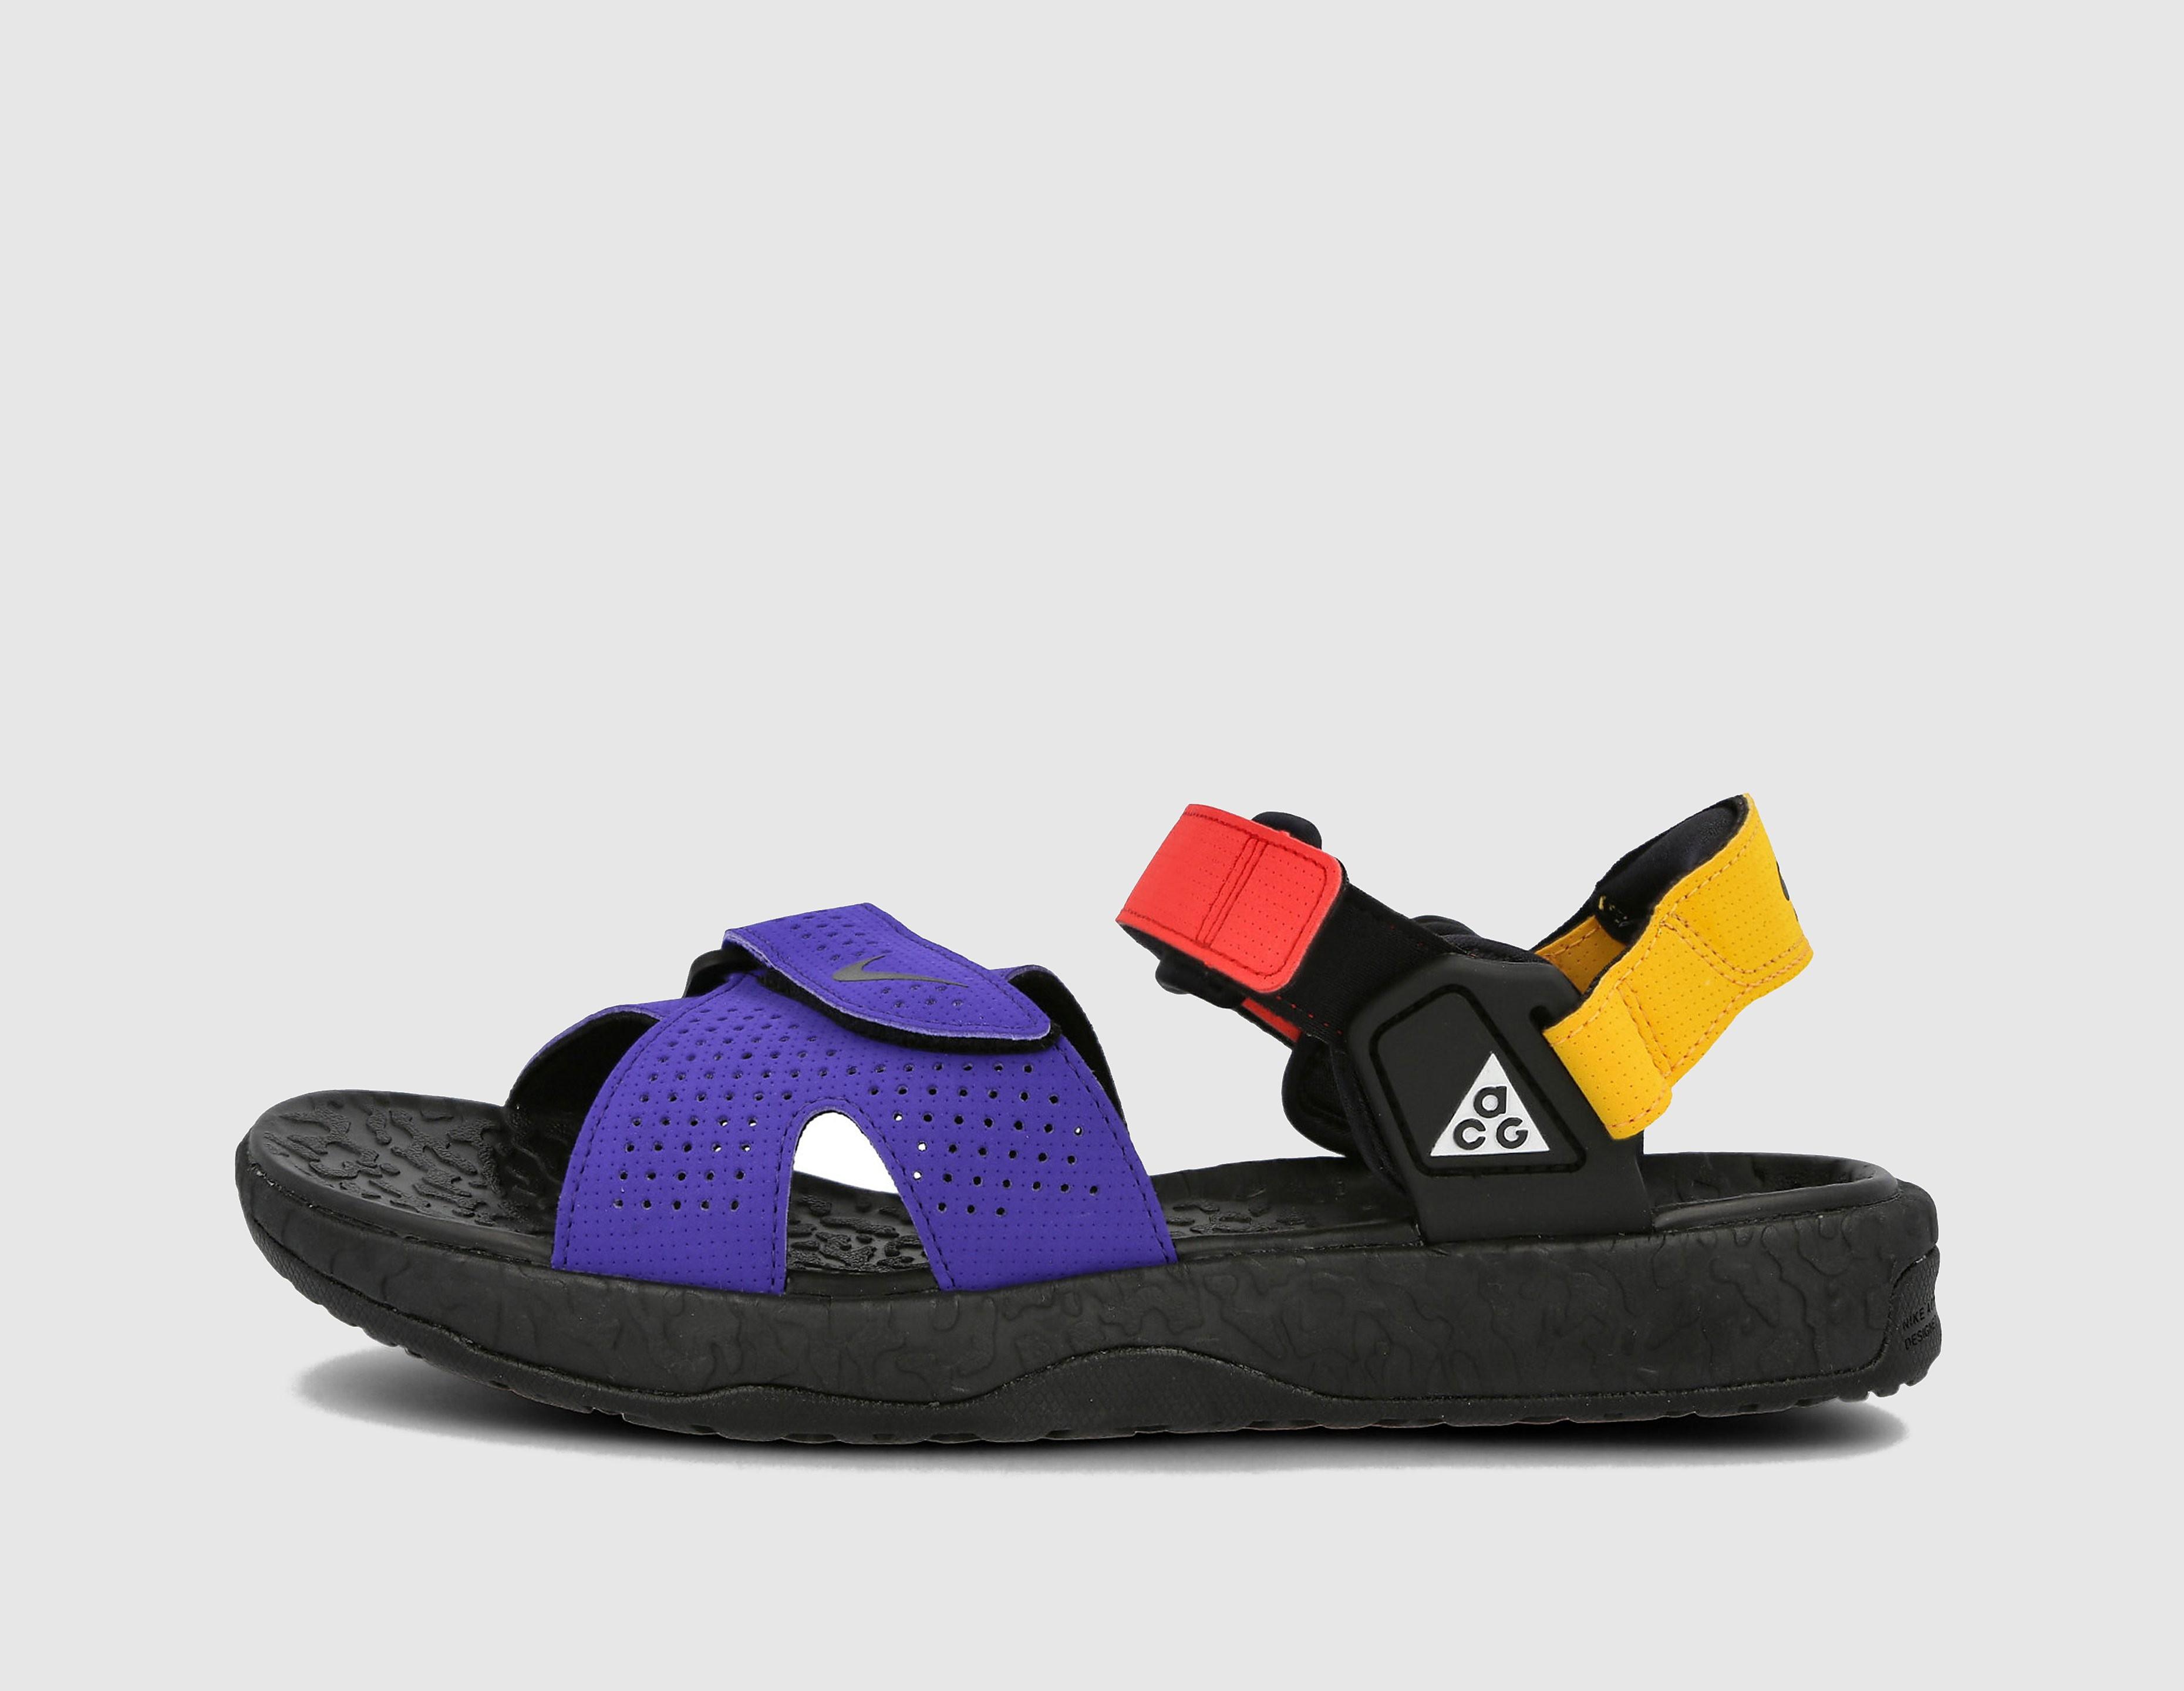 Nike ACG Deschutz Sandal QS Women's, morado